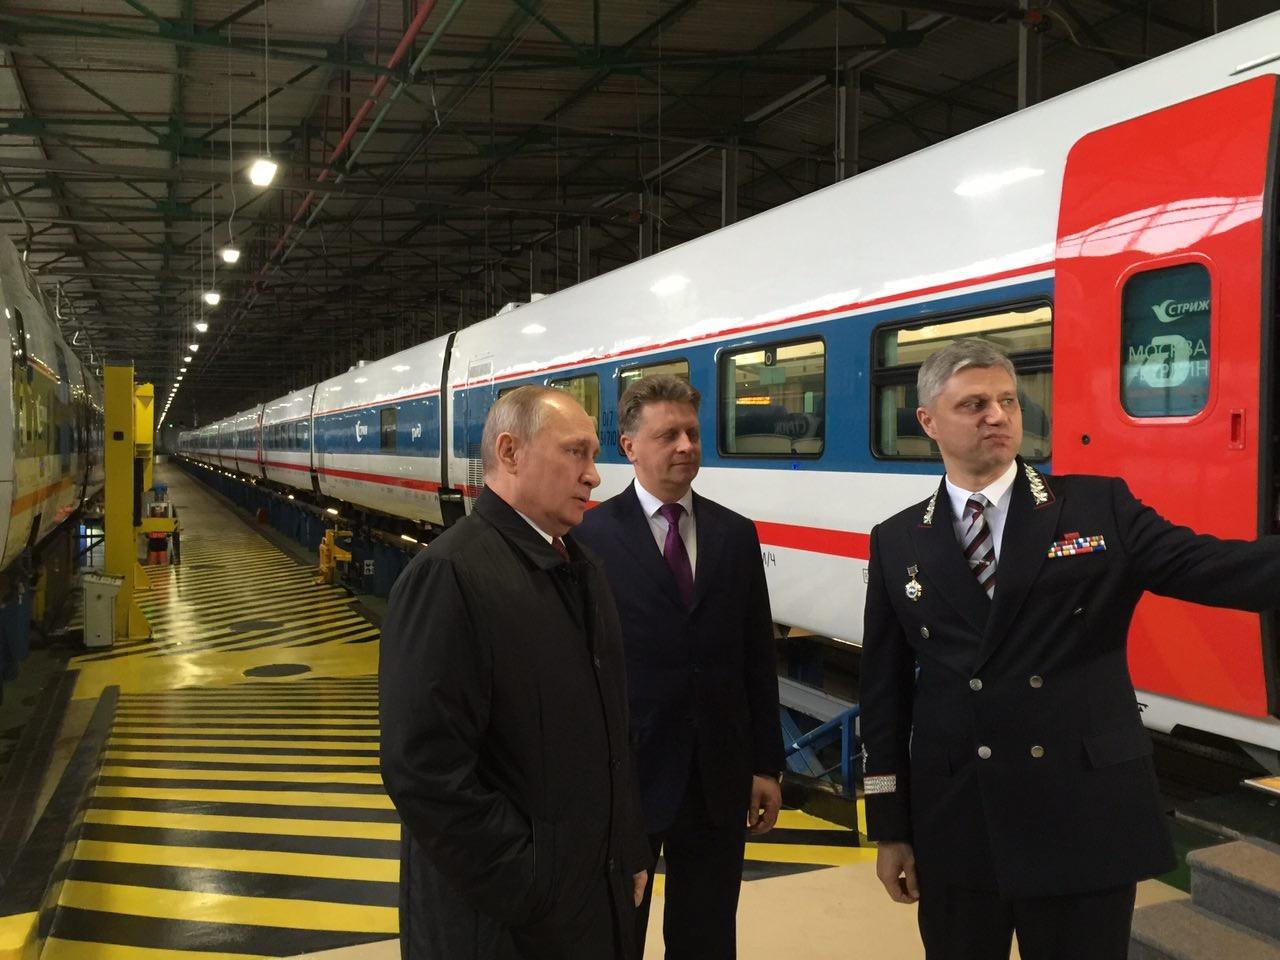 <p>Президент России Владимир Путин. Фото: &copy;L!FE</p>